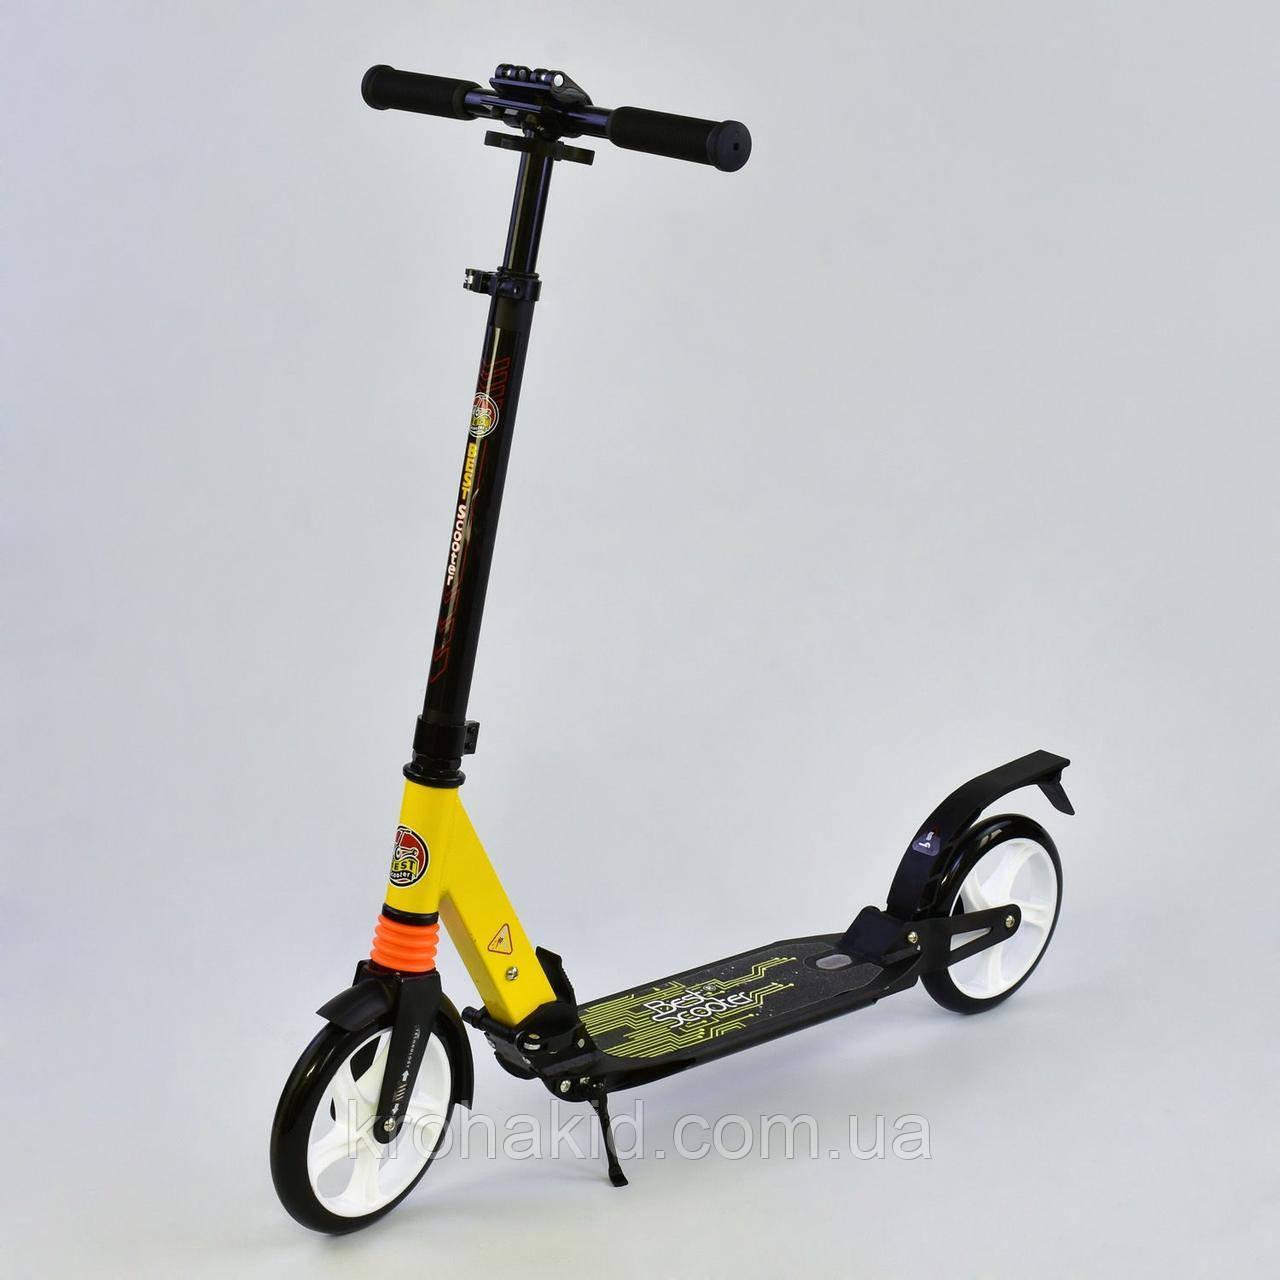 Городской самокат Best Scooter 00055 (желтый)